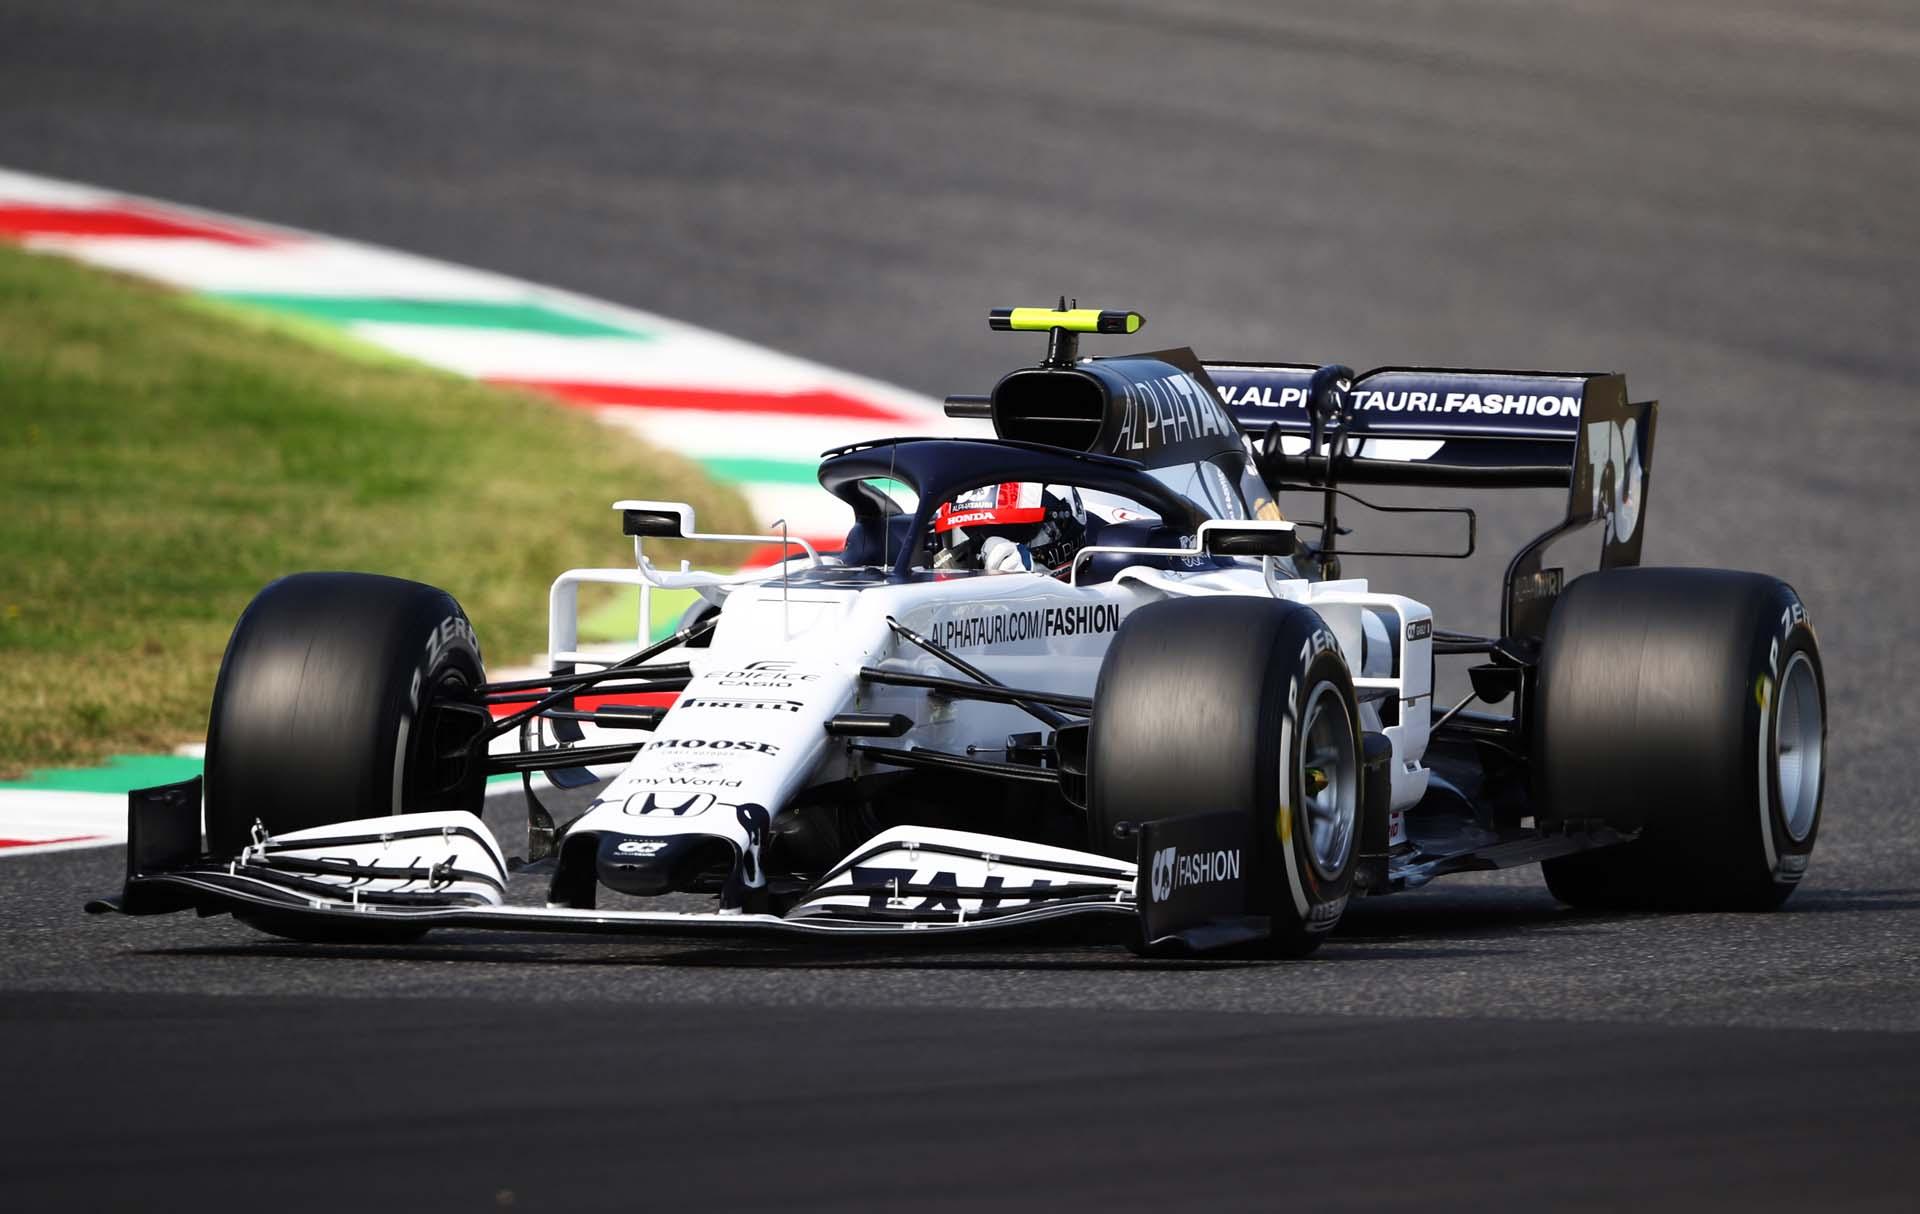 F1 Grand Prix of Tuscany - Practice